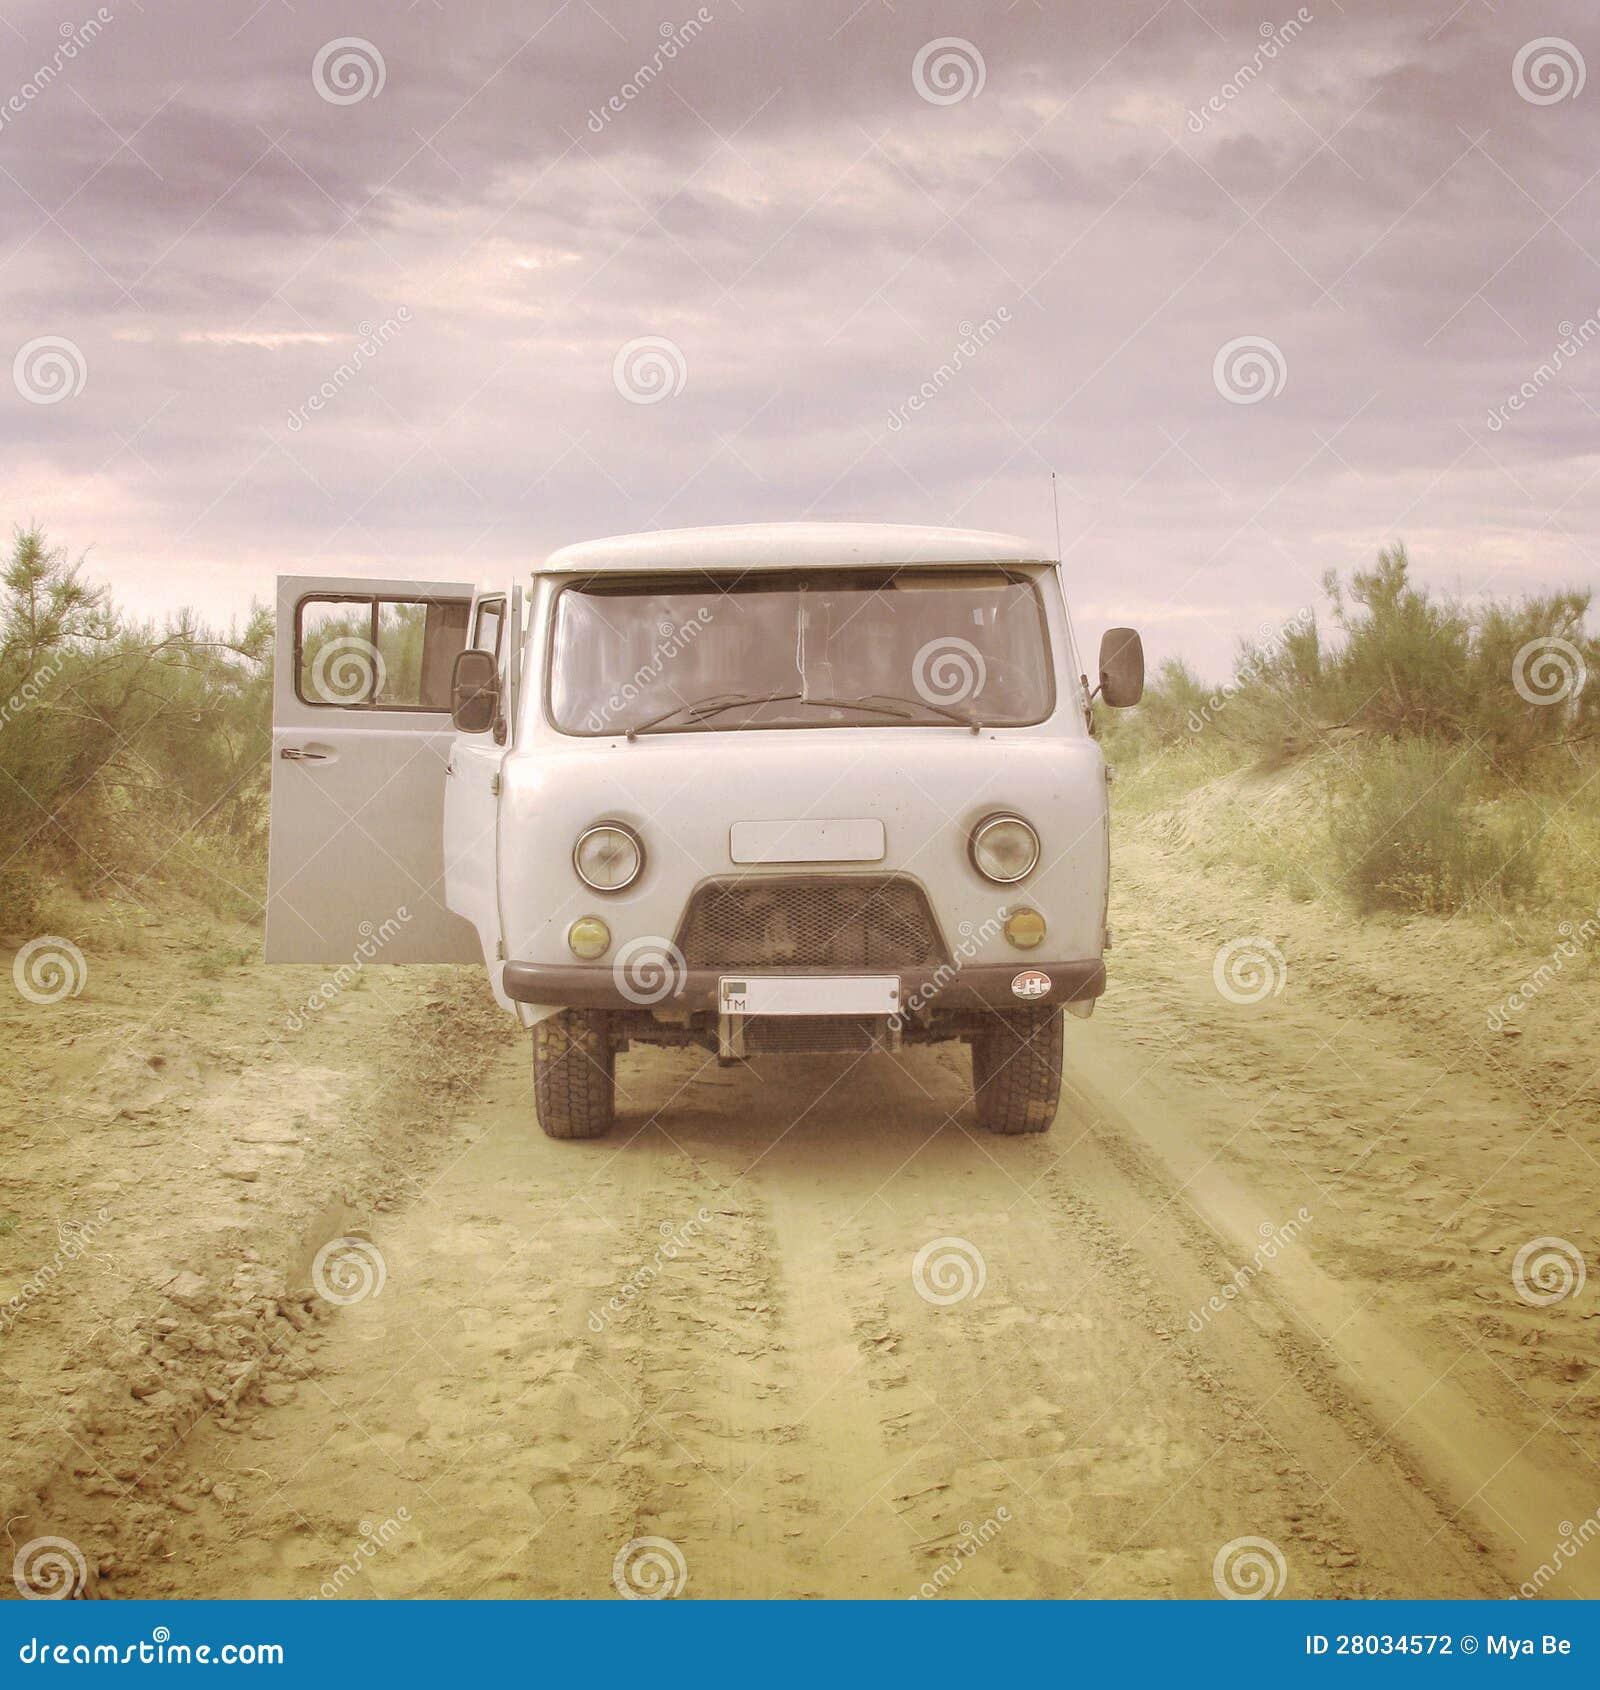 Old soviet style minibus in the desert